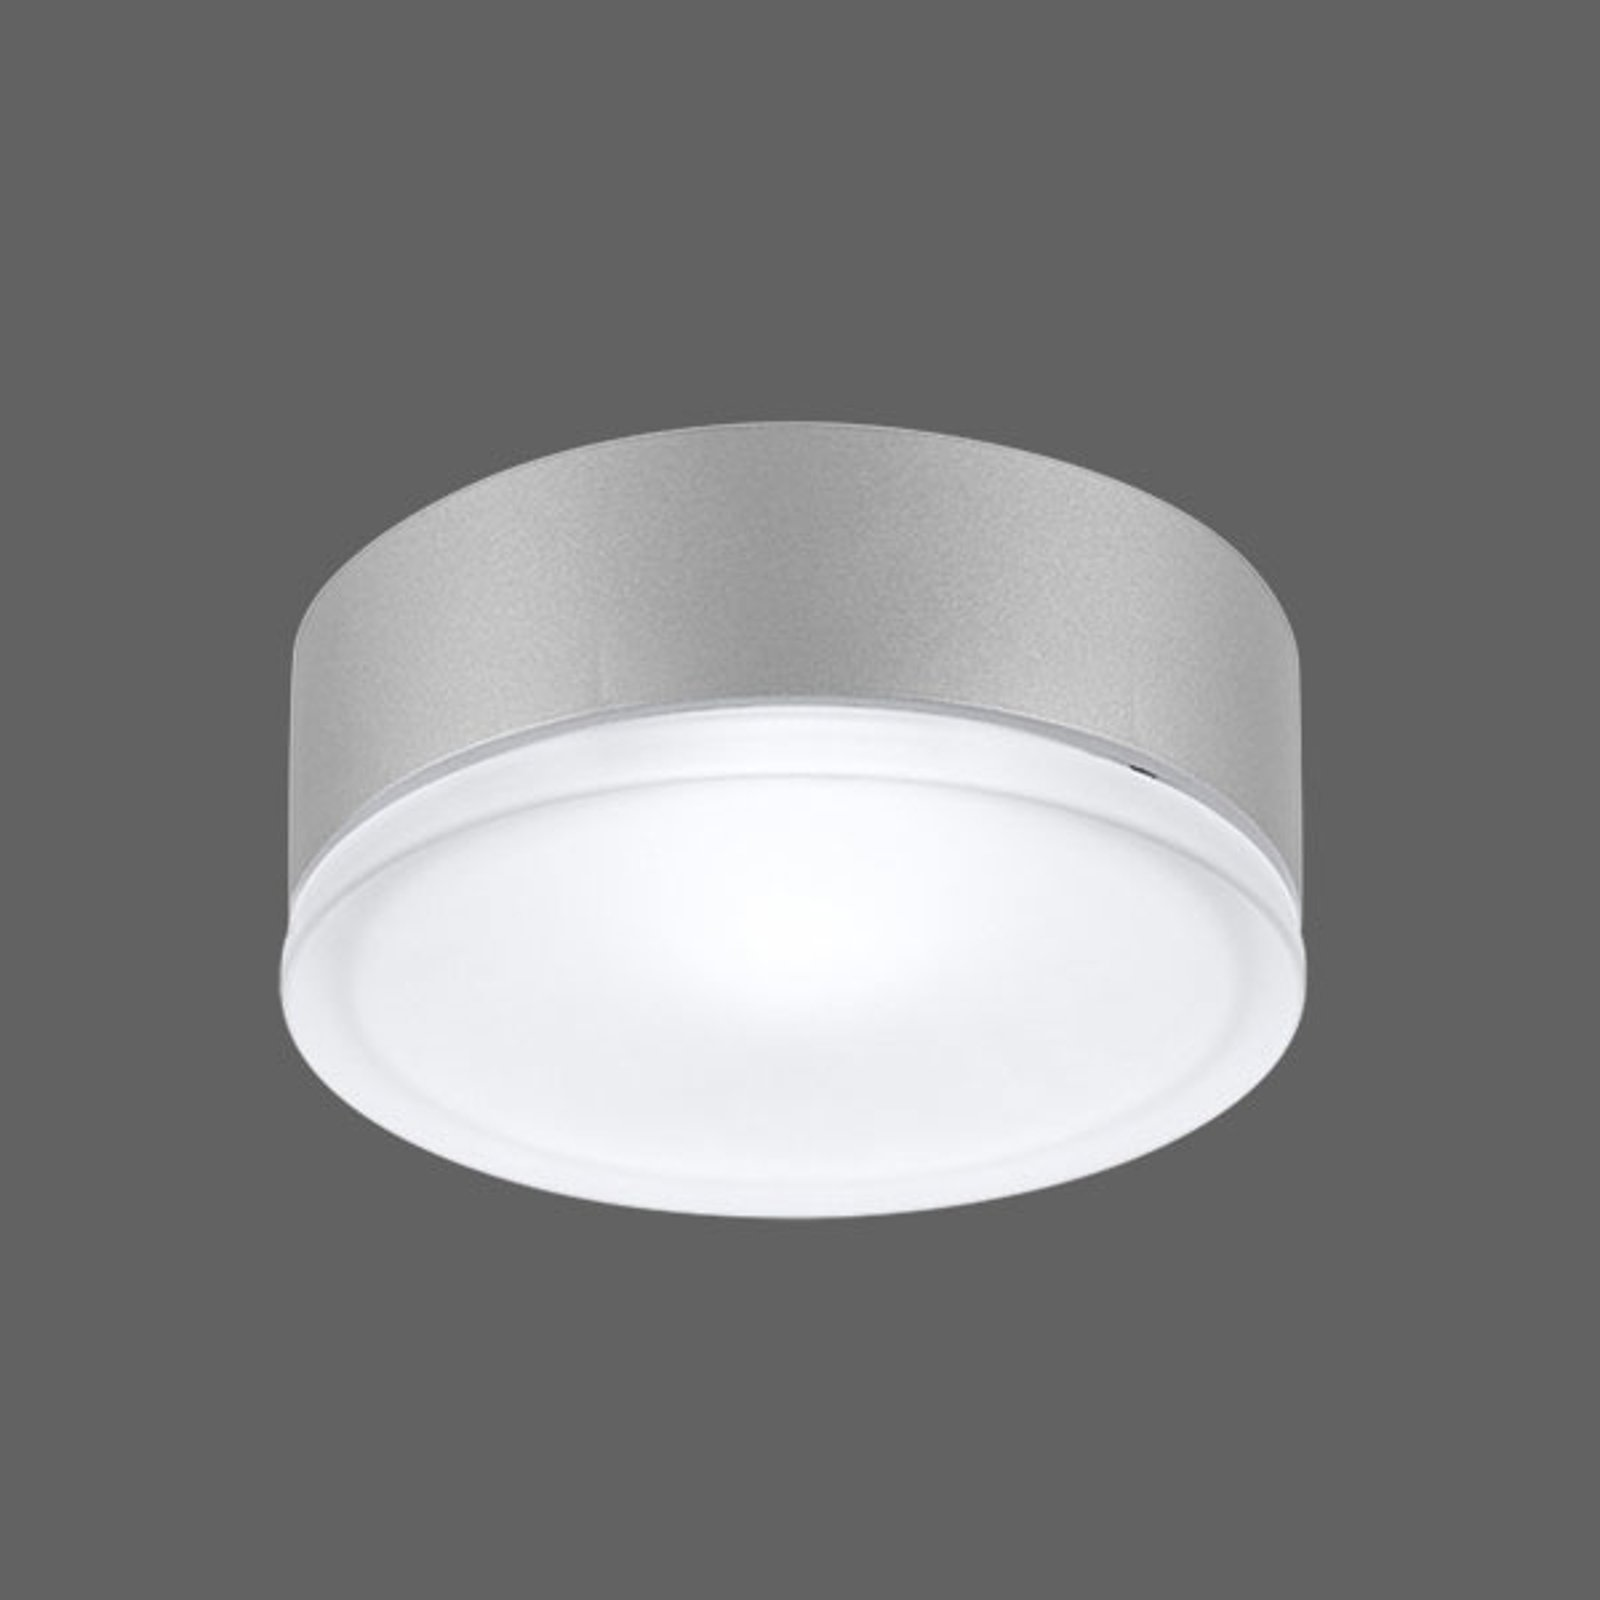 Effektiv vegglampe Drop 22 LED grå 3 000 K